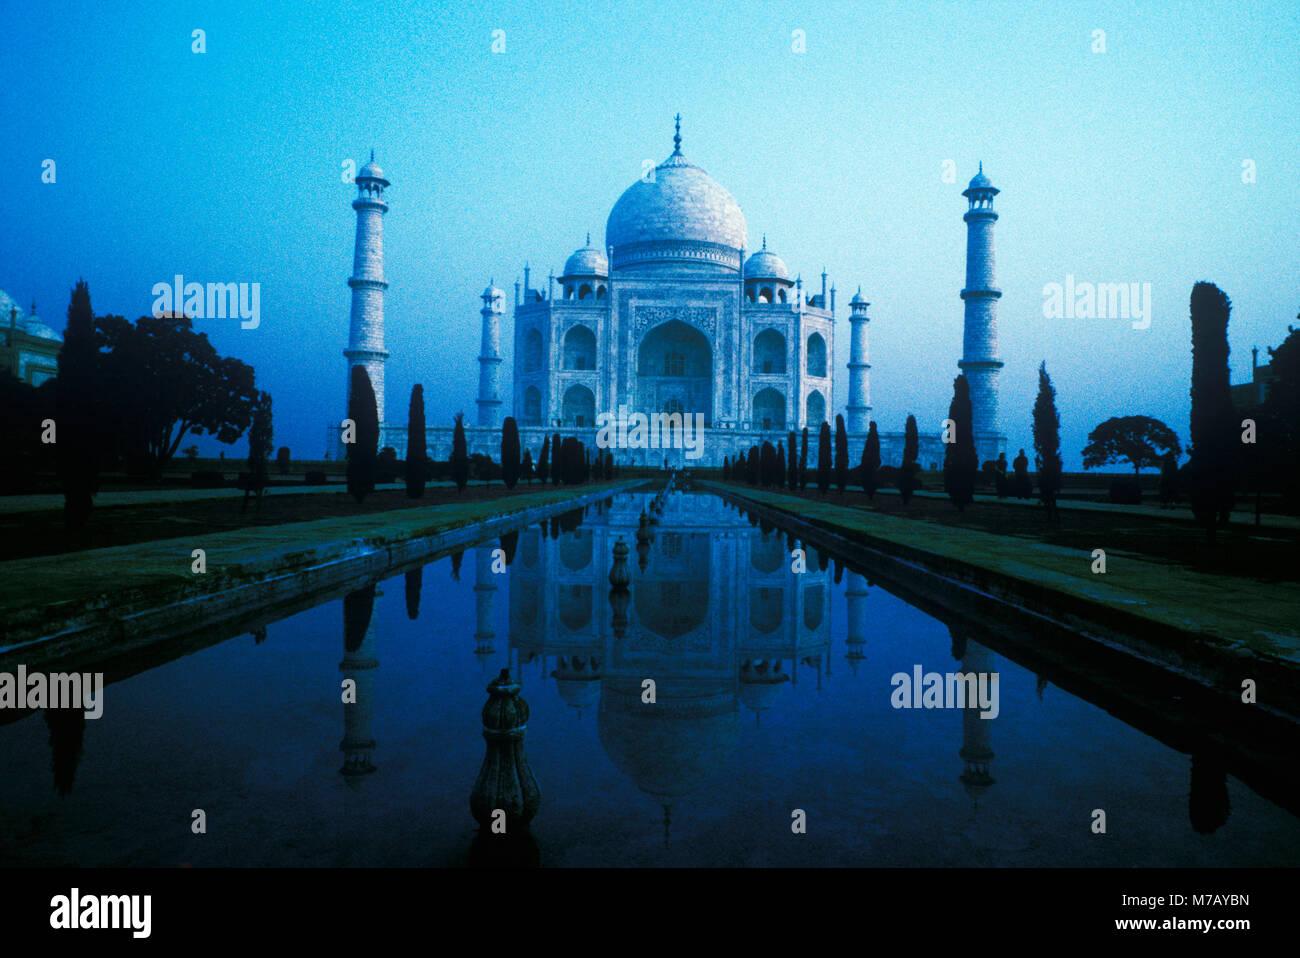 Facade of a monument, Taj Mahal, Agra, Uttar Pradesh, India - Stock Image